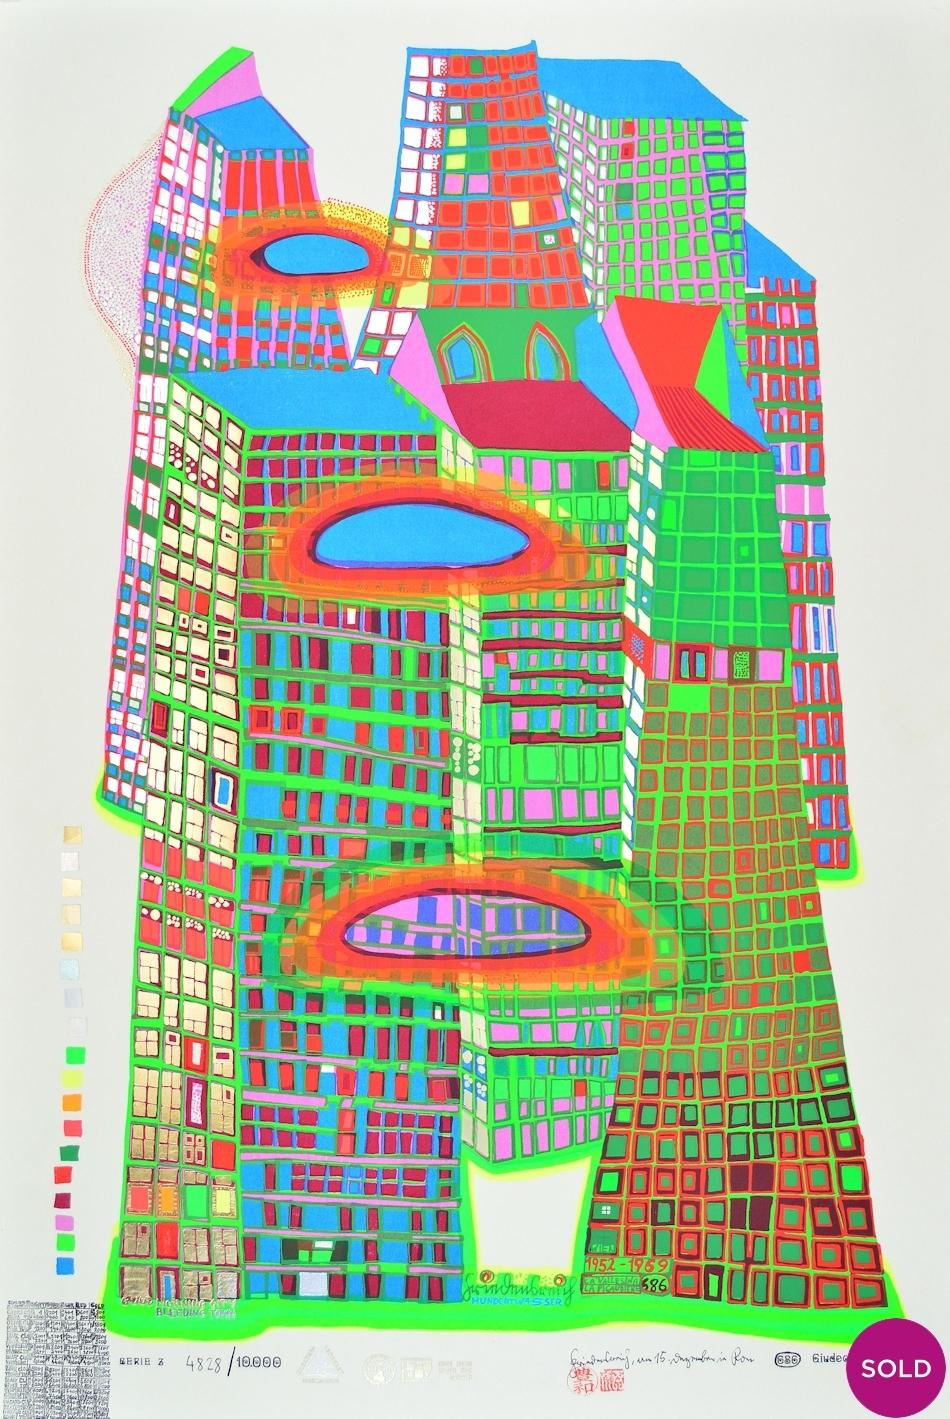 Hundertwasser Good Morning City Print For Sale I ARTEDIO